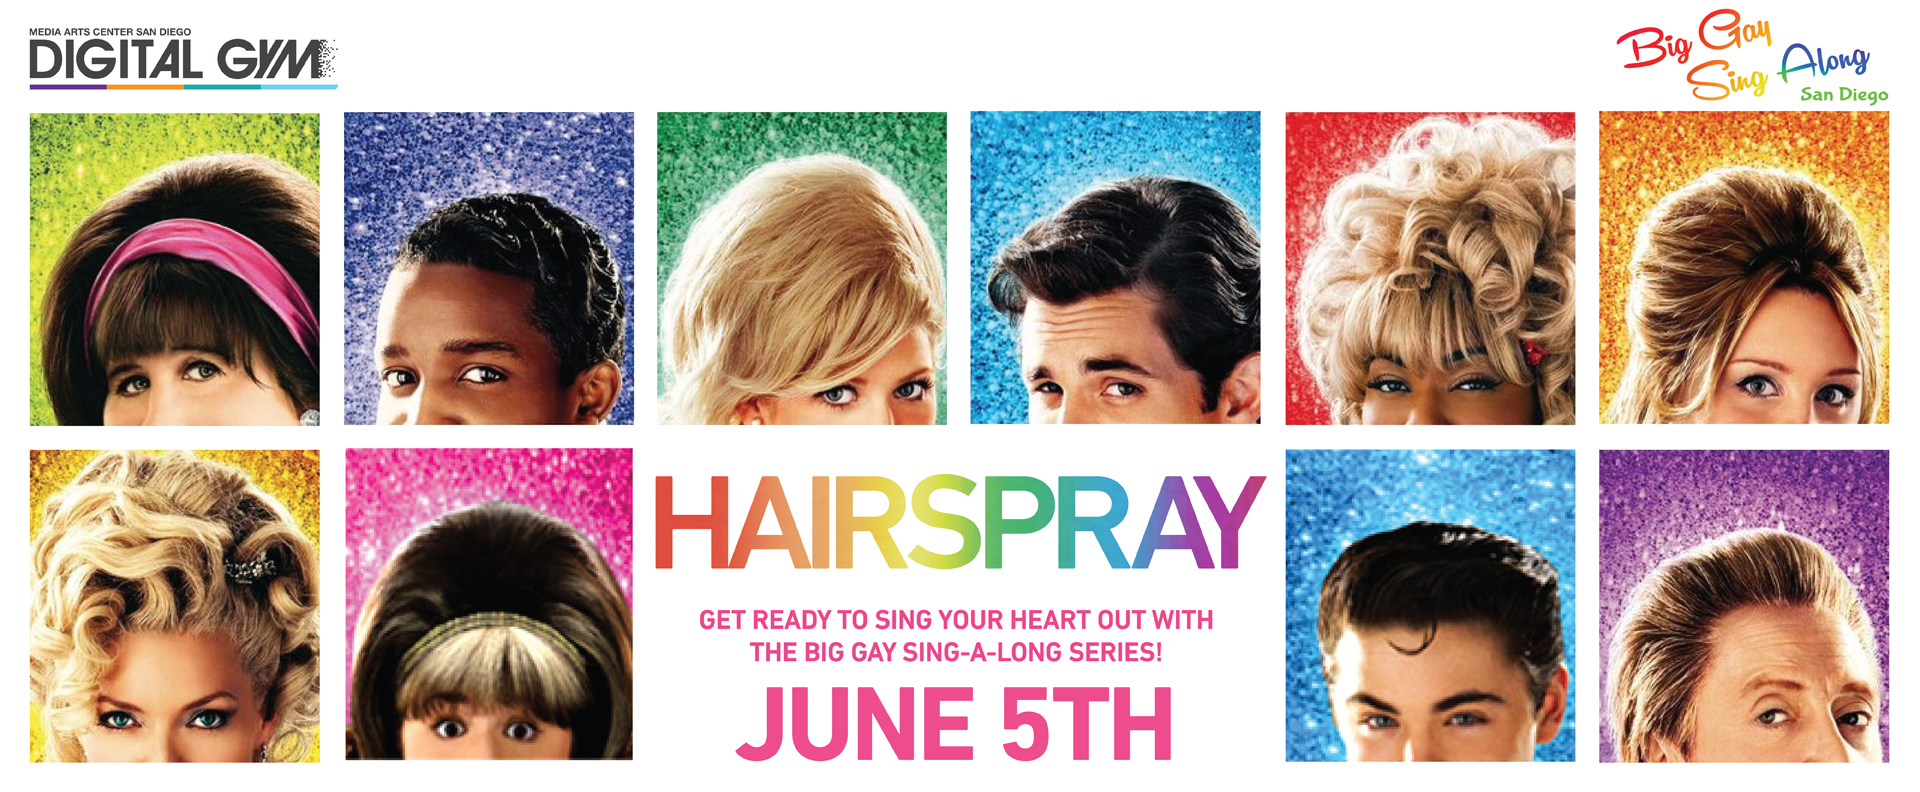 Big Gay Sing-A-Long: Hairspray (2007) (June 5)